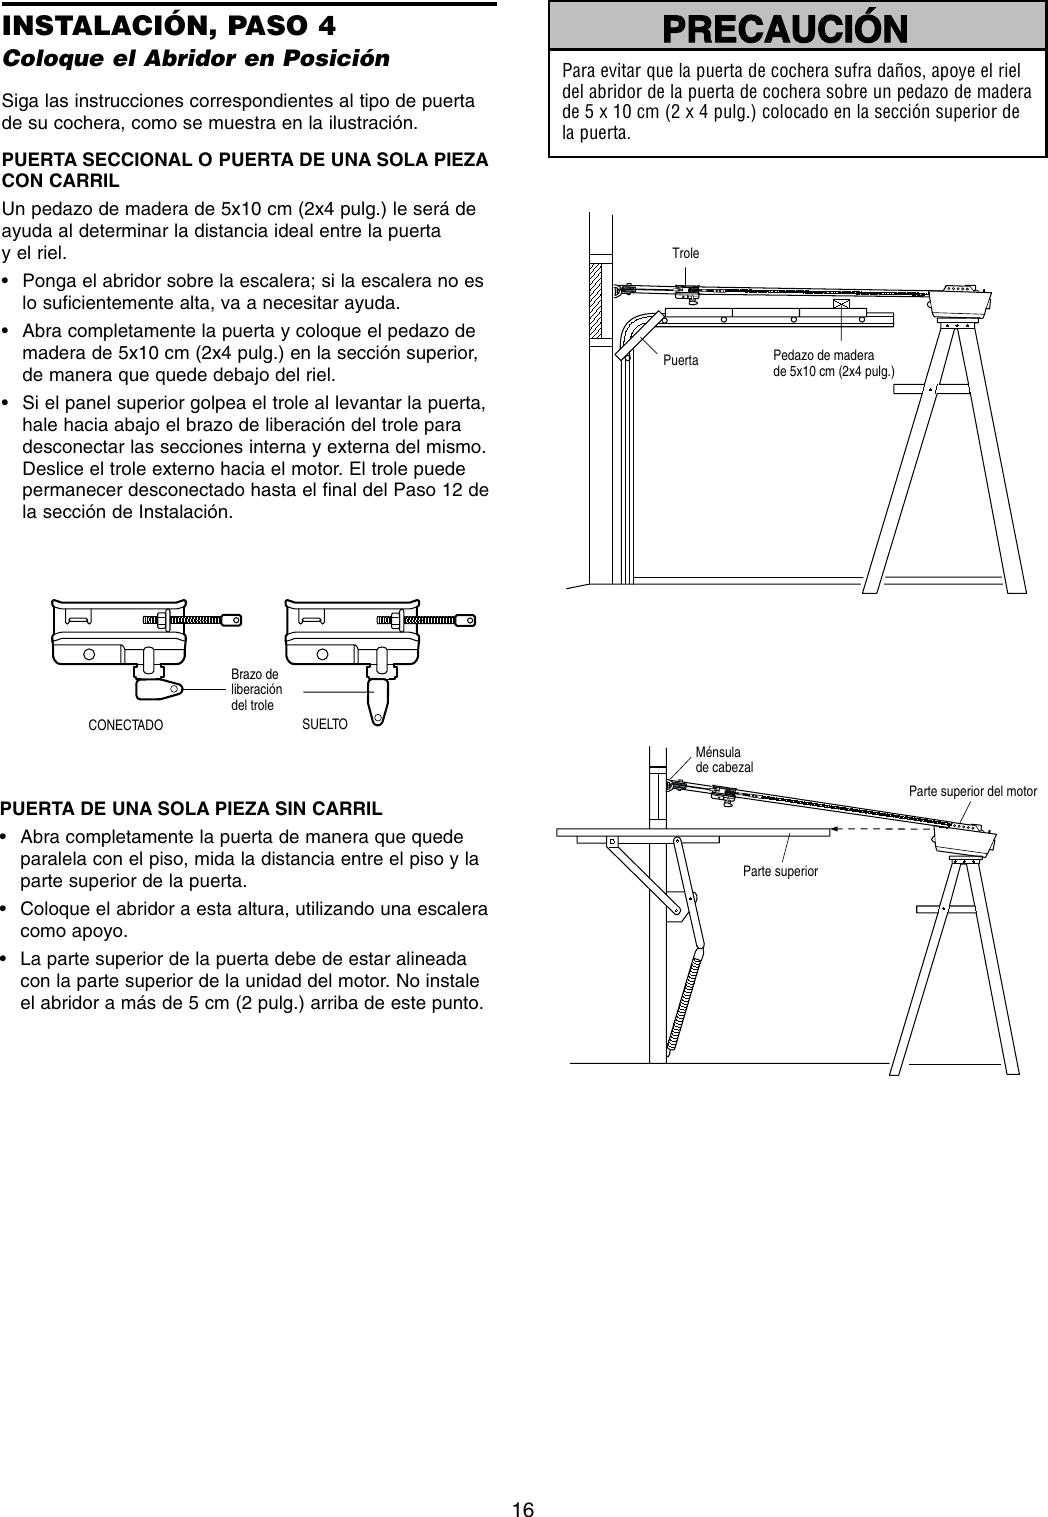 Sears 139 53960Srt Users Manual SRS DOM GDO 139.53960,53970 ... on